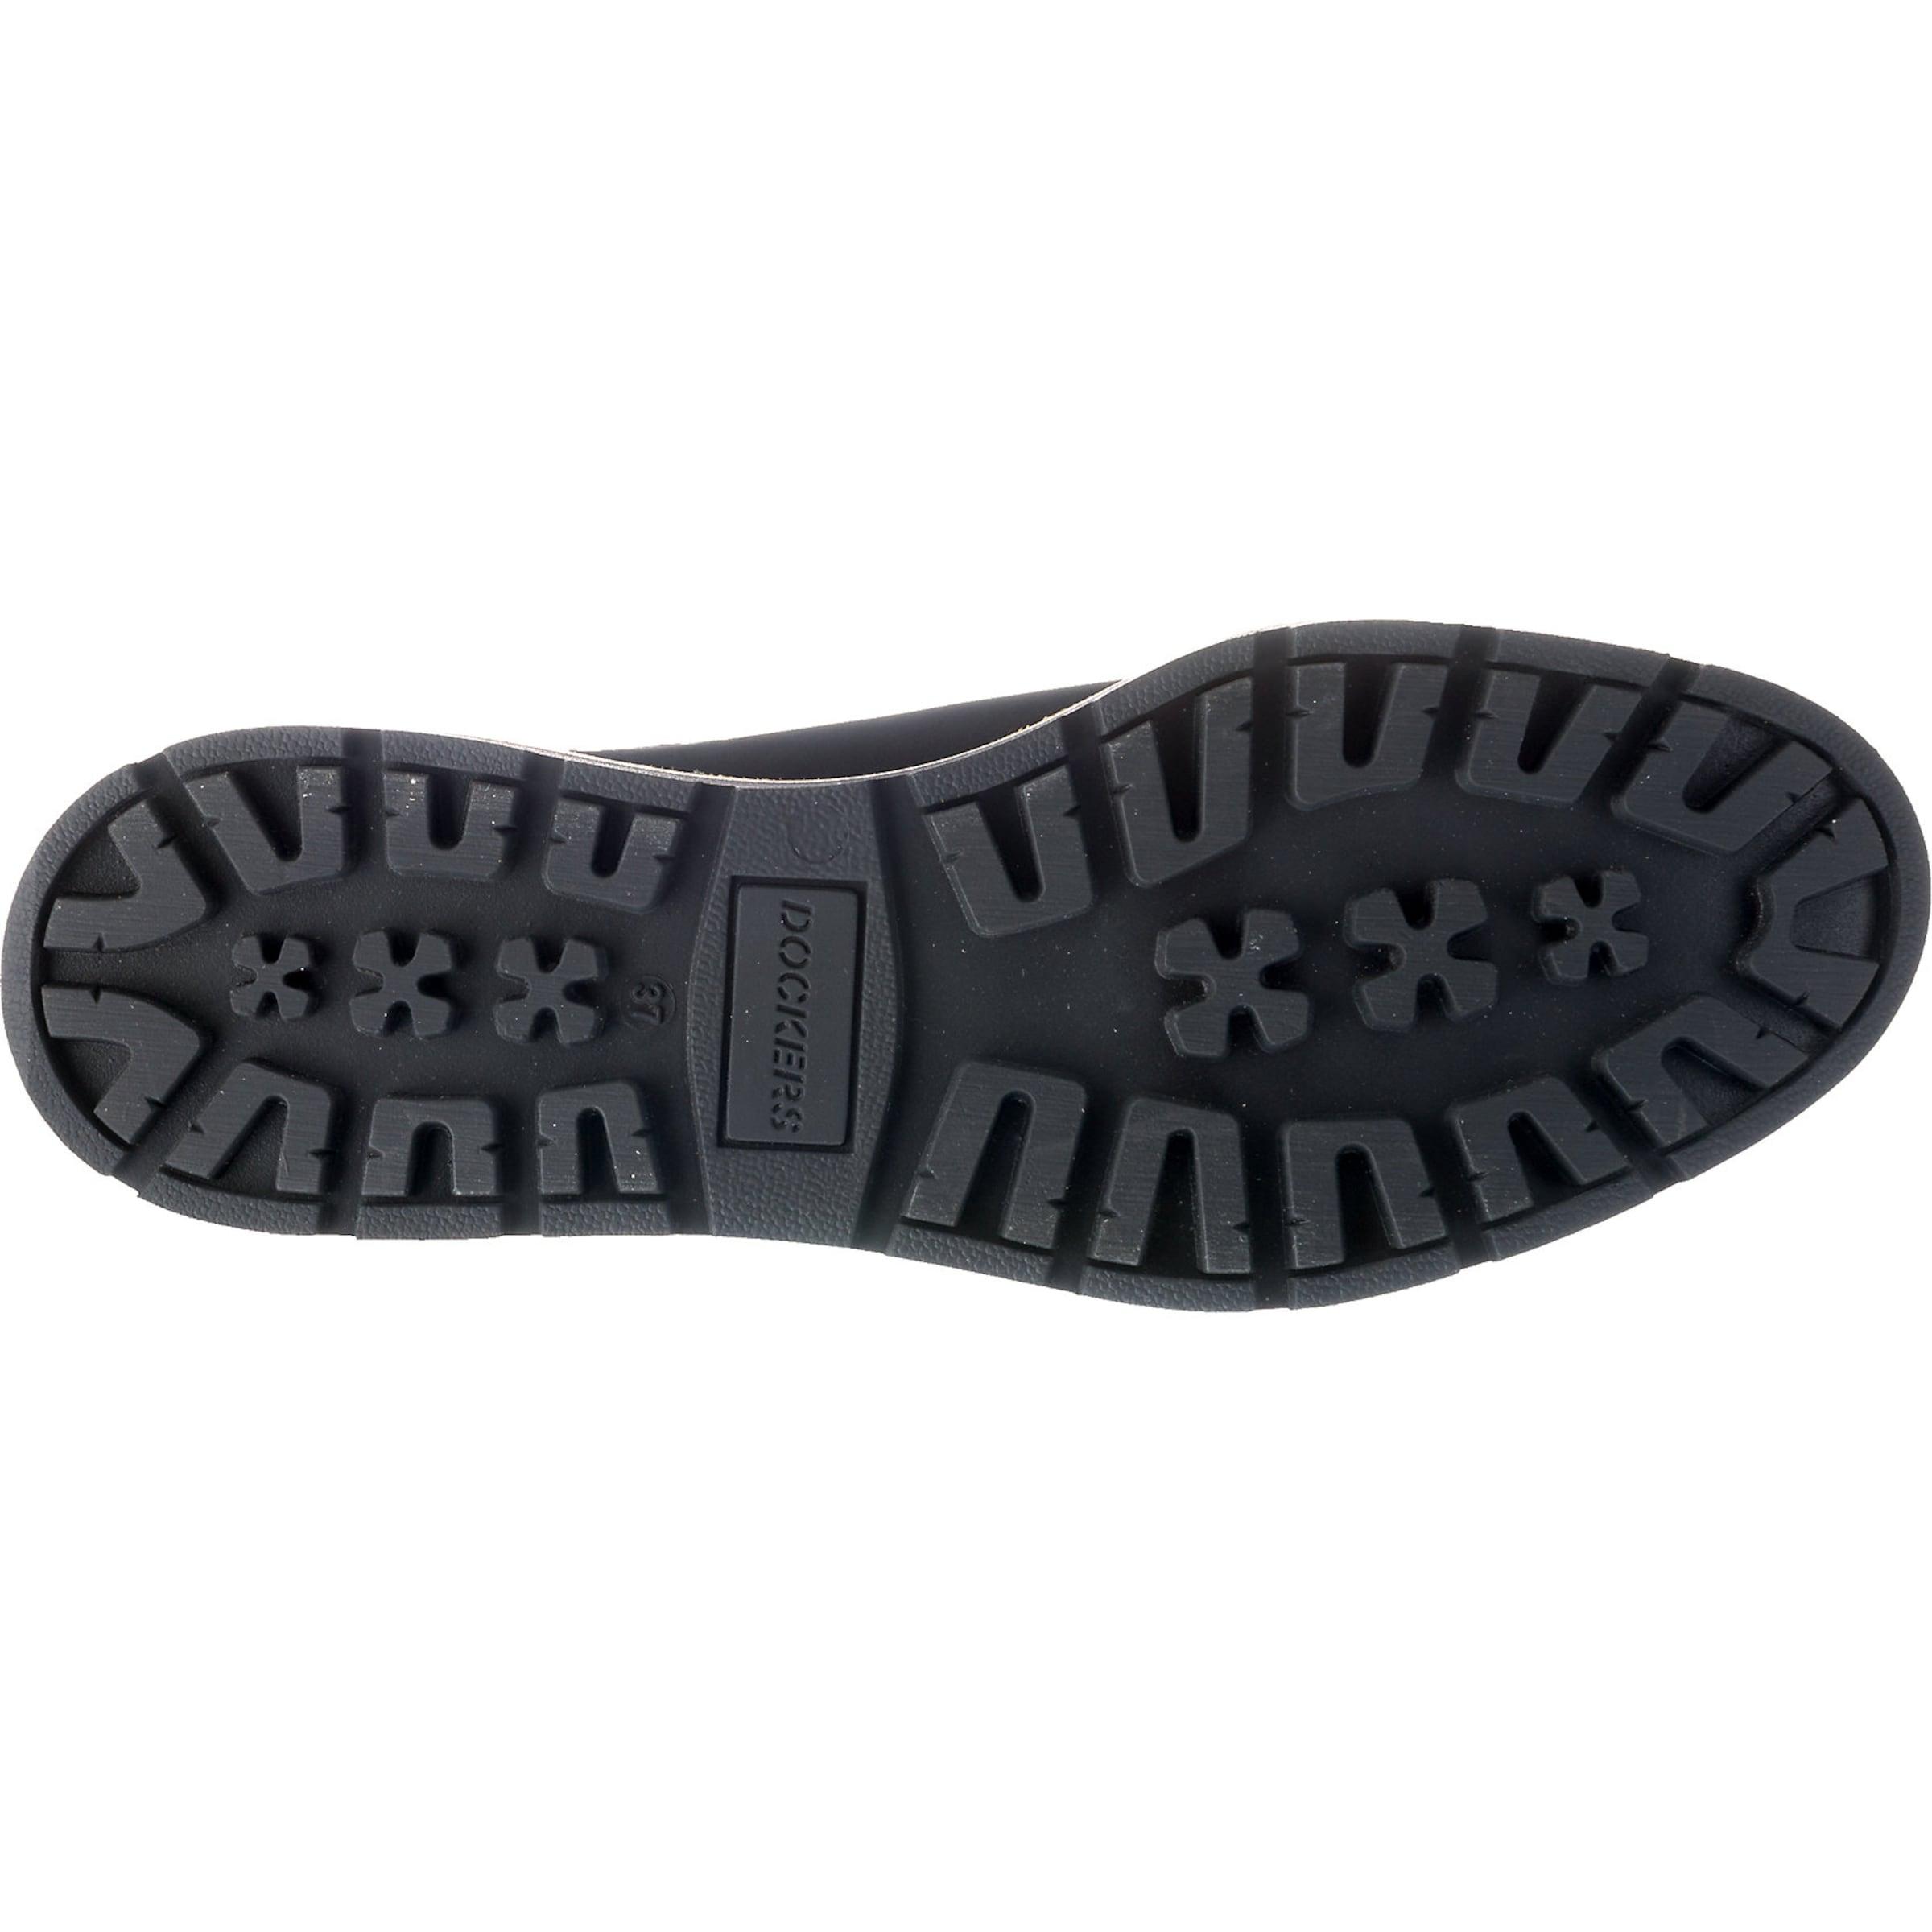 Chelsea Dockers Gerli Boots In By Schwarz bgYf7y6v